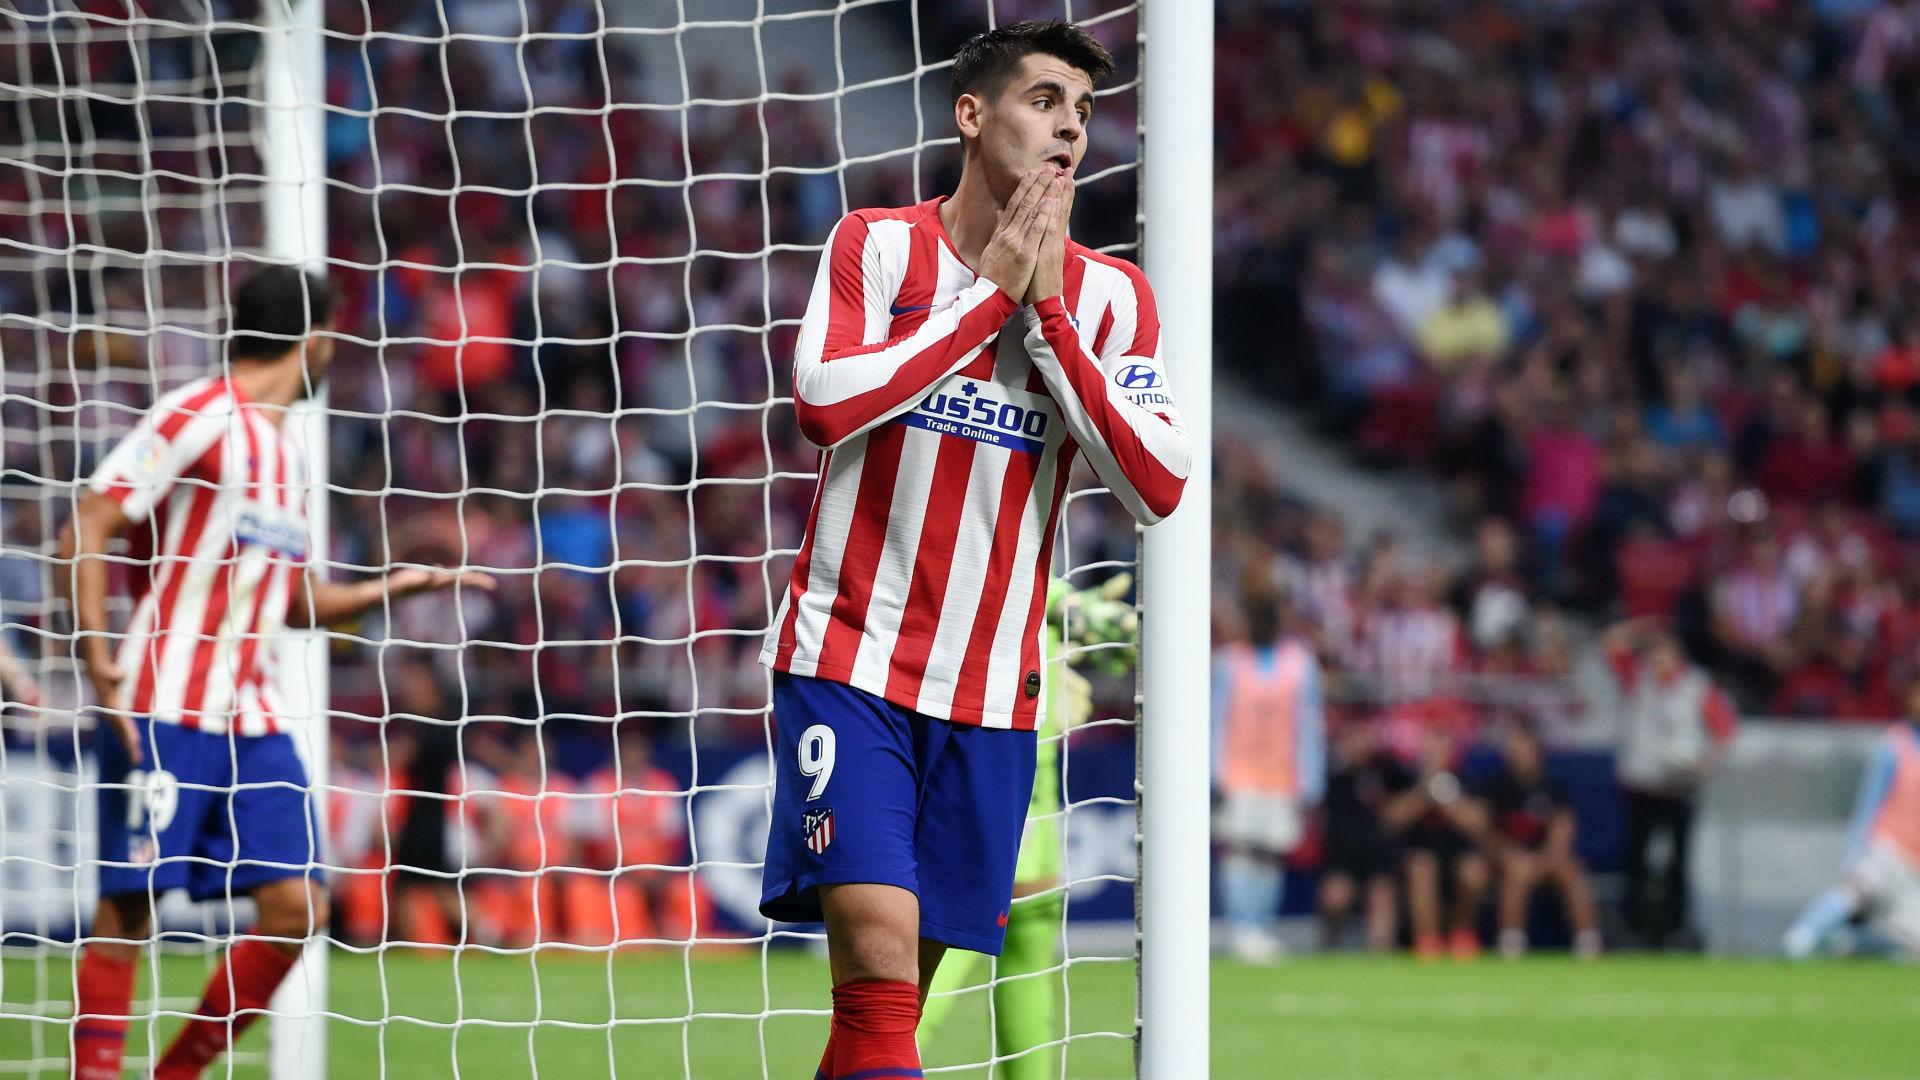 Atletico Madrid 0 Celta Vigo 0: Simeone's side draw a blank against brilliant Blanco